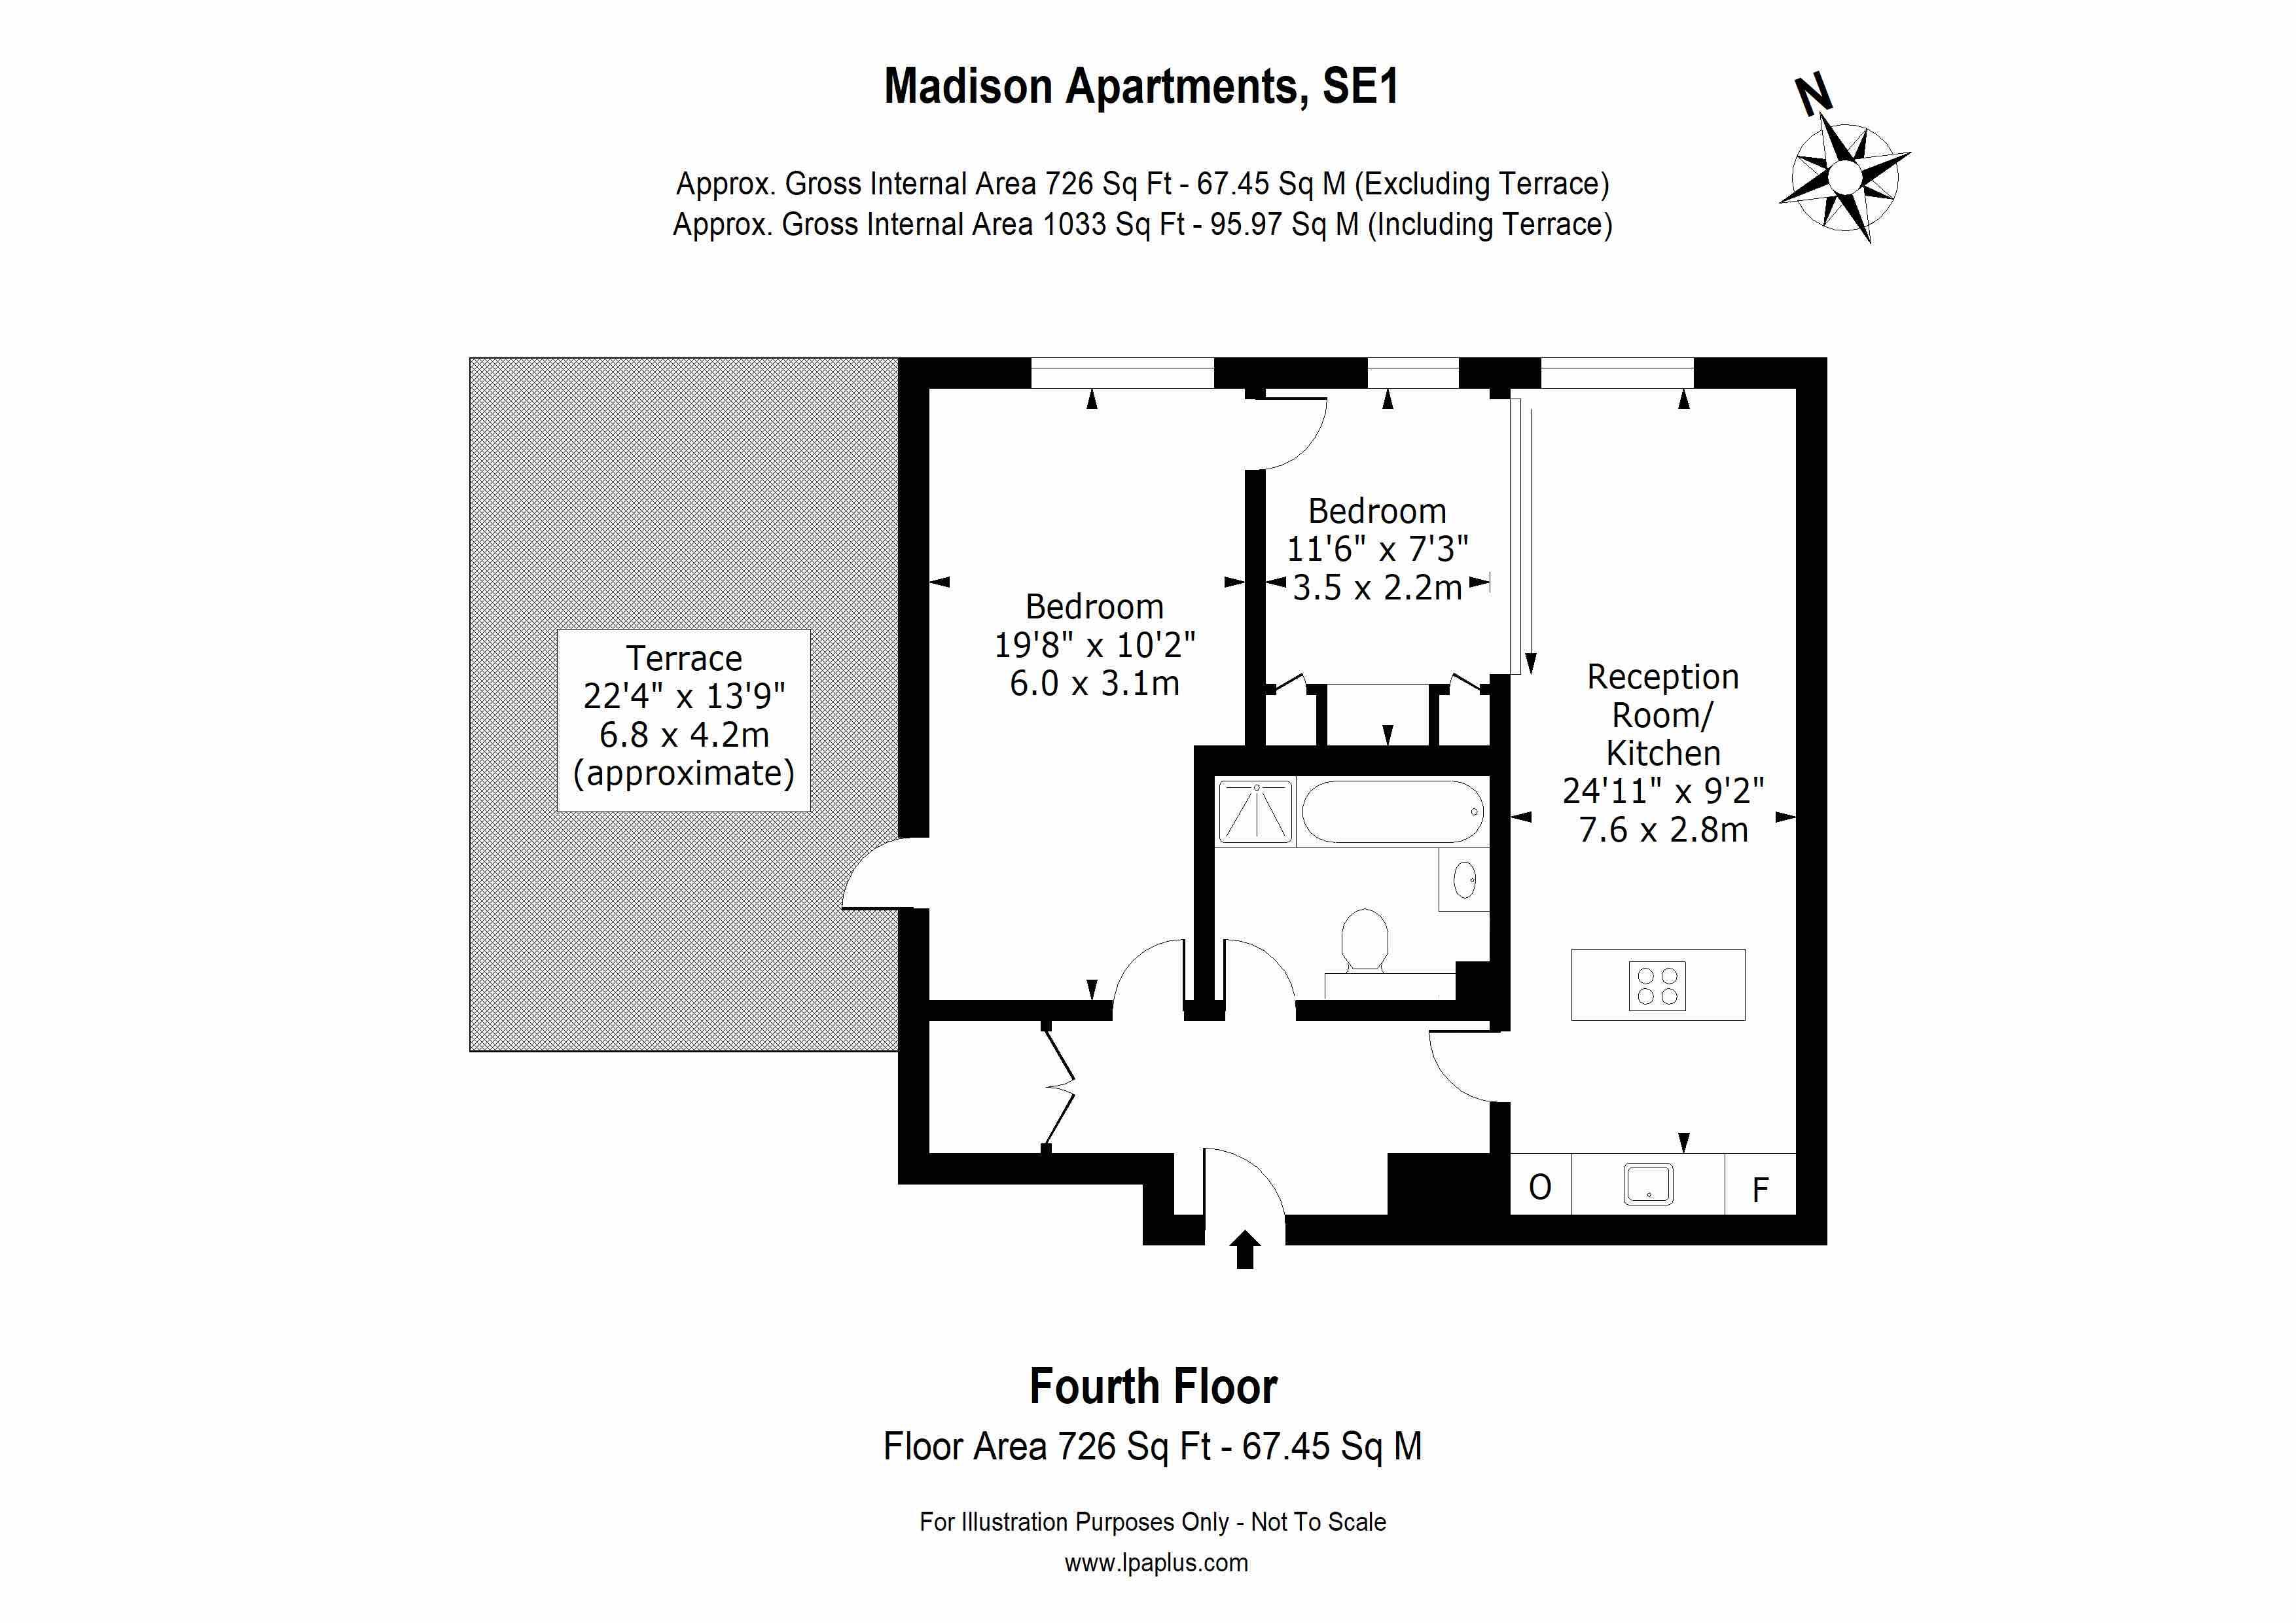 contemporary-warehouse-madison-apartments-se1-floorplan